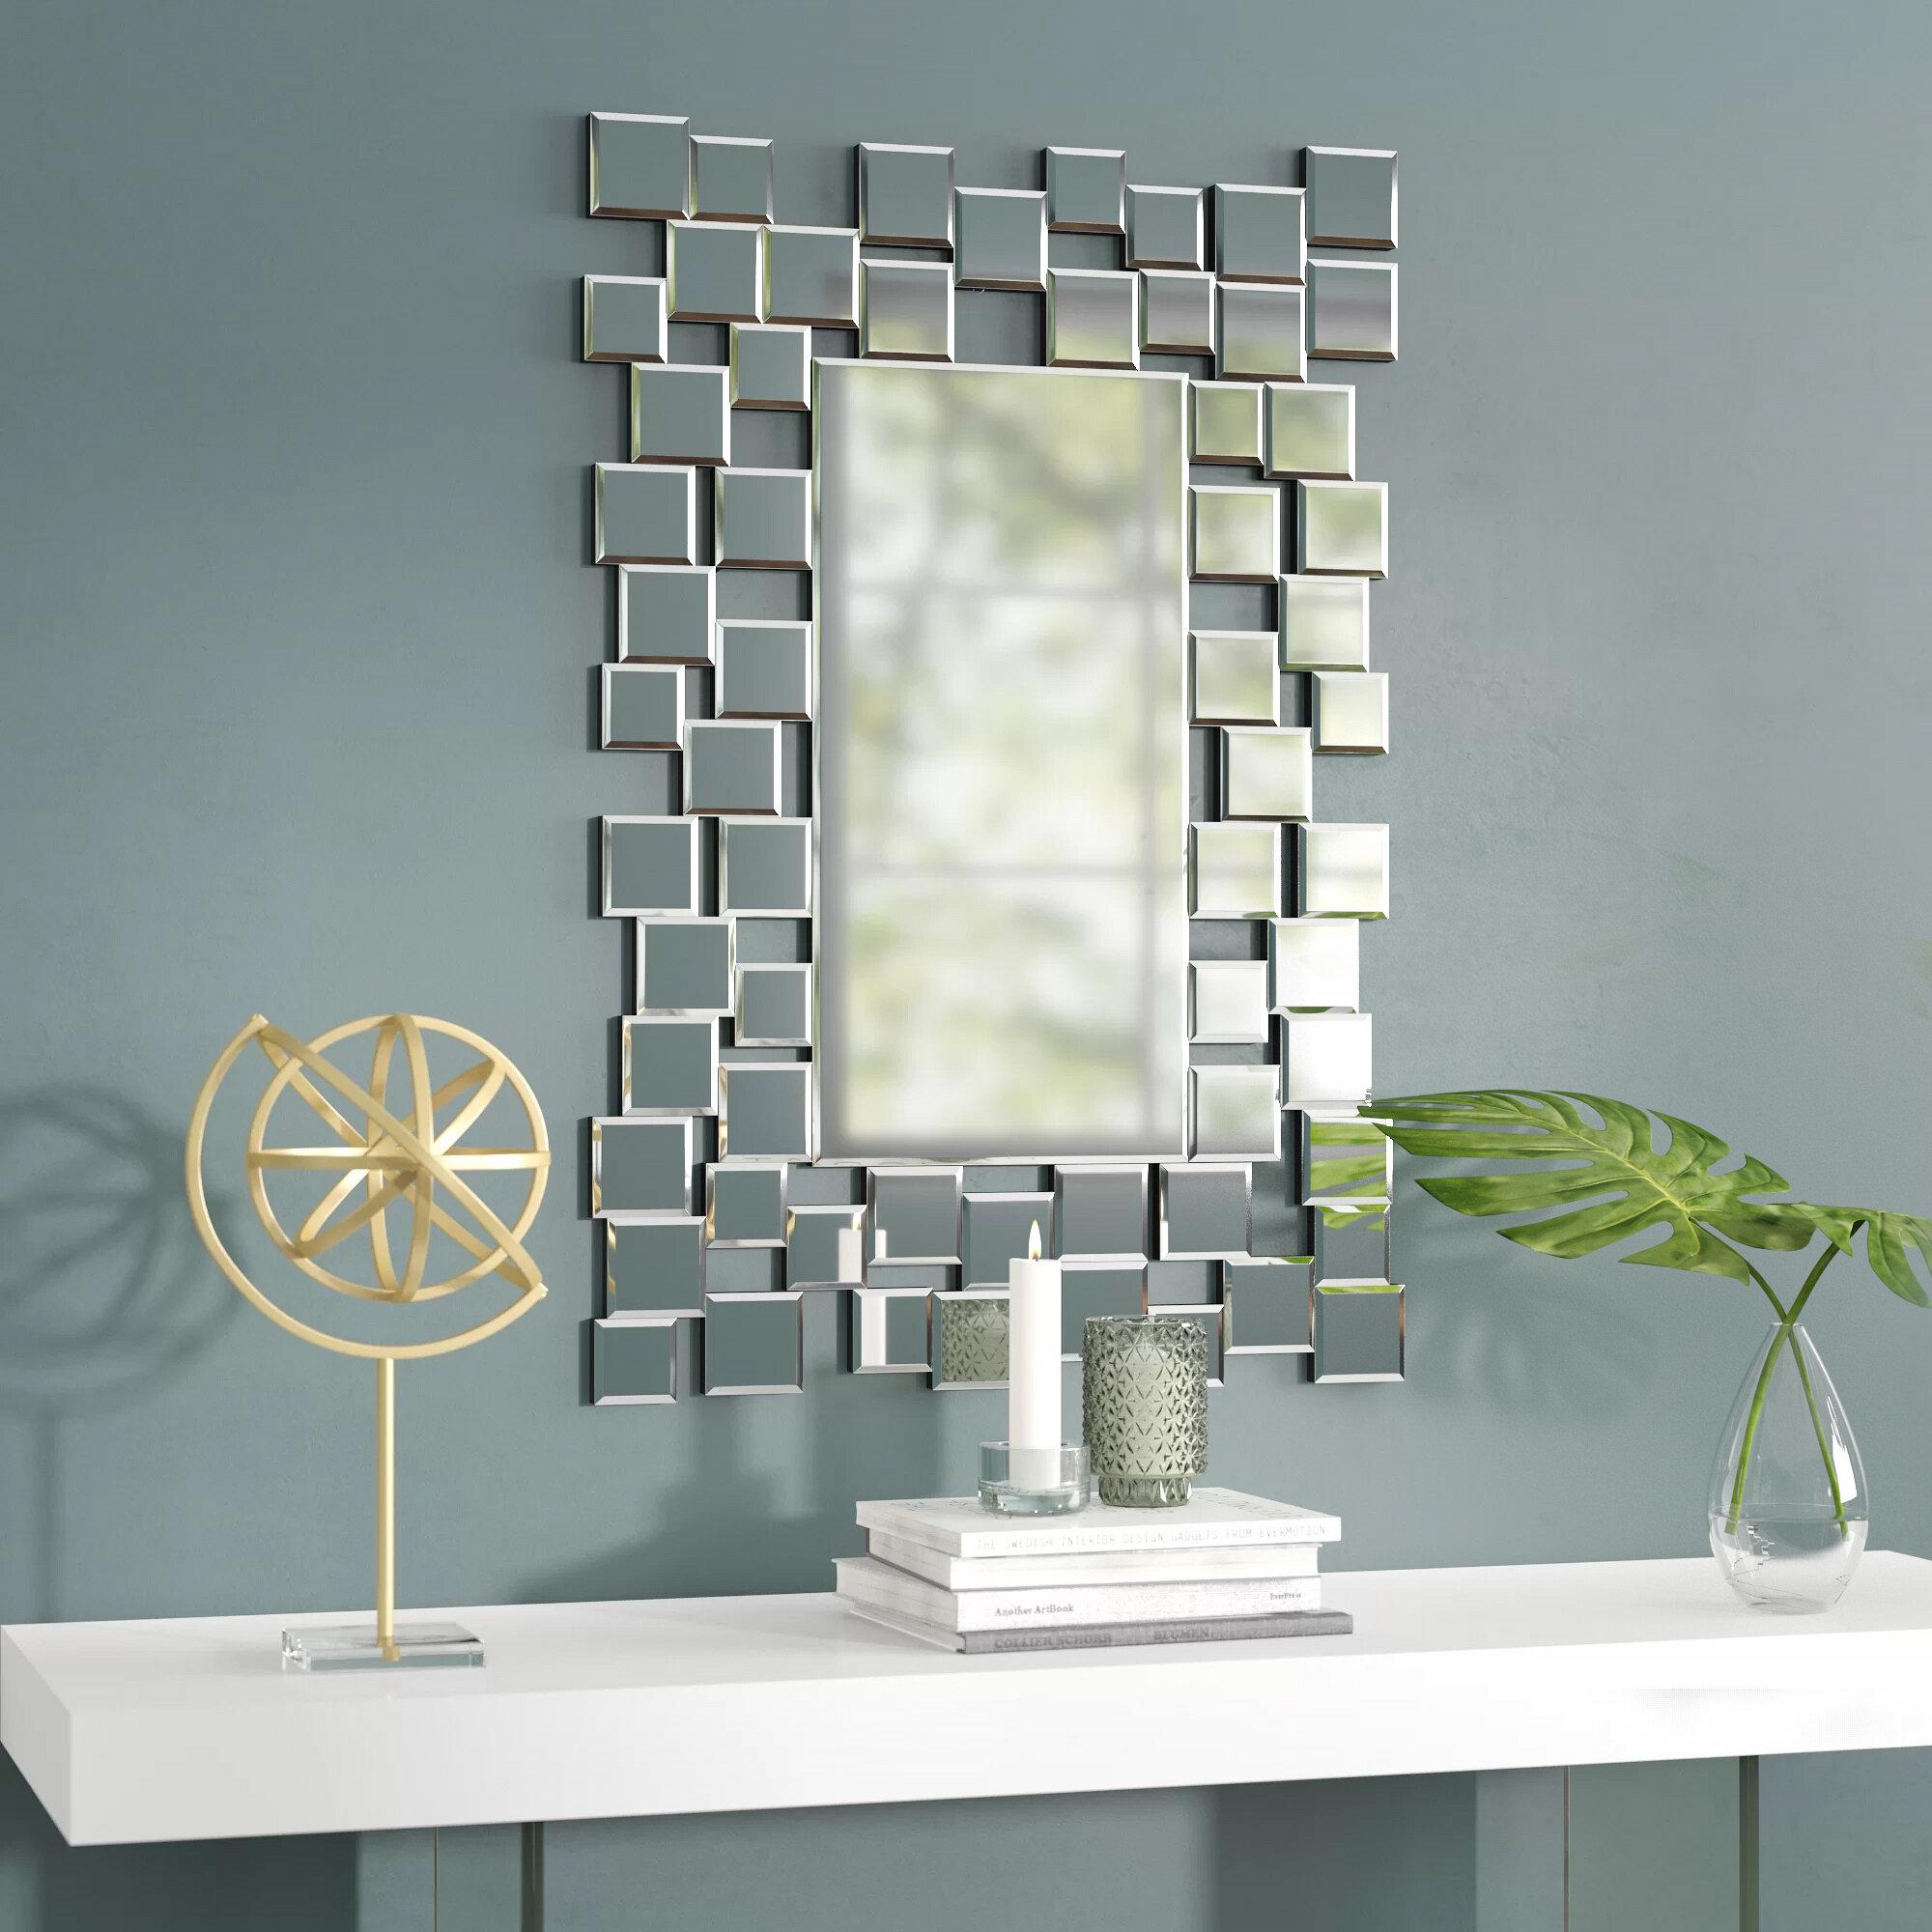 Pennsburg Rectangle Wall Mirror Regarding Famous Brayden Studio Modern & Contemporary Accent Wall Mirror (View 12 of 20)